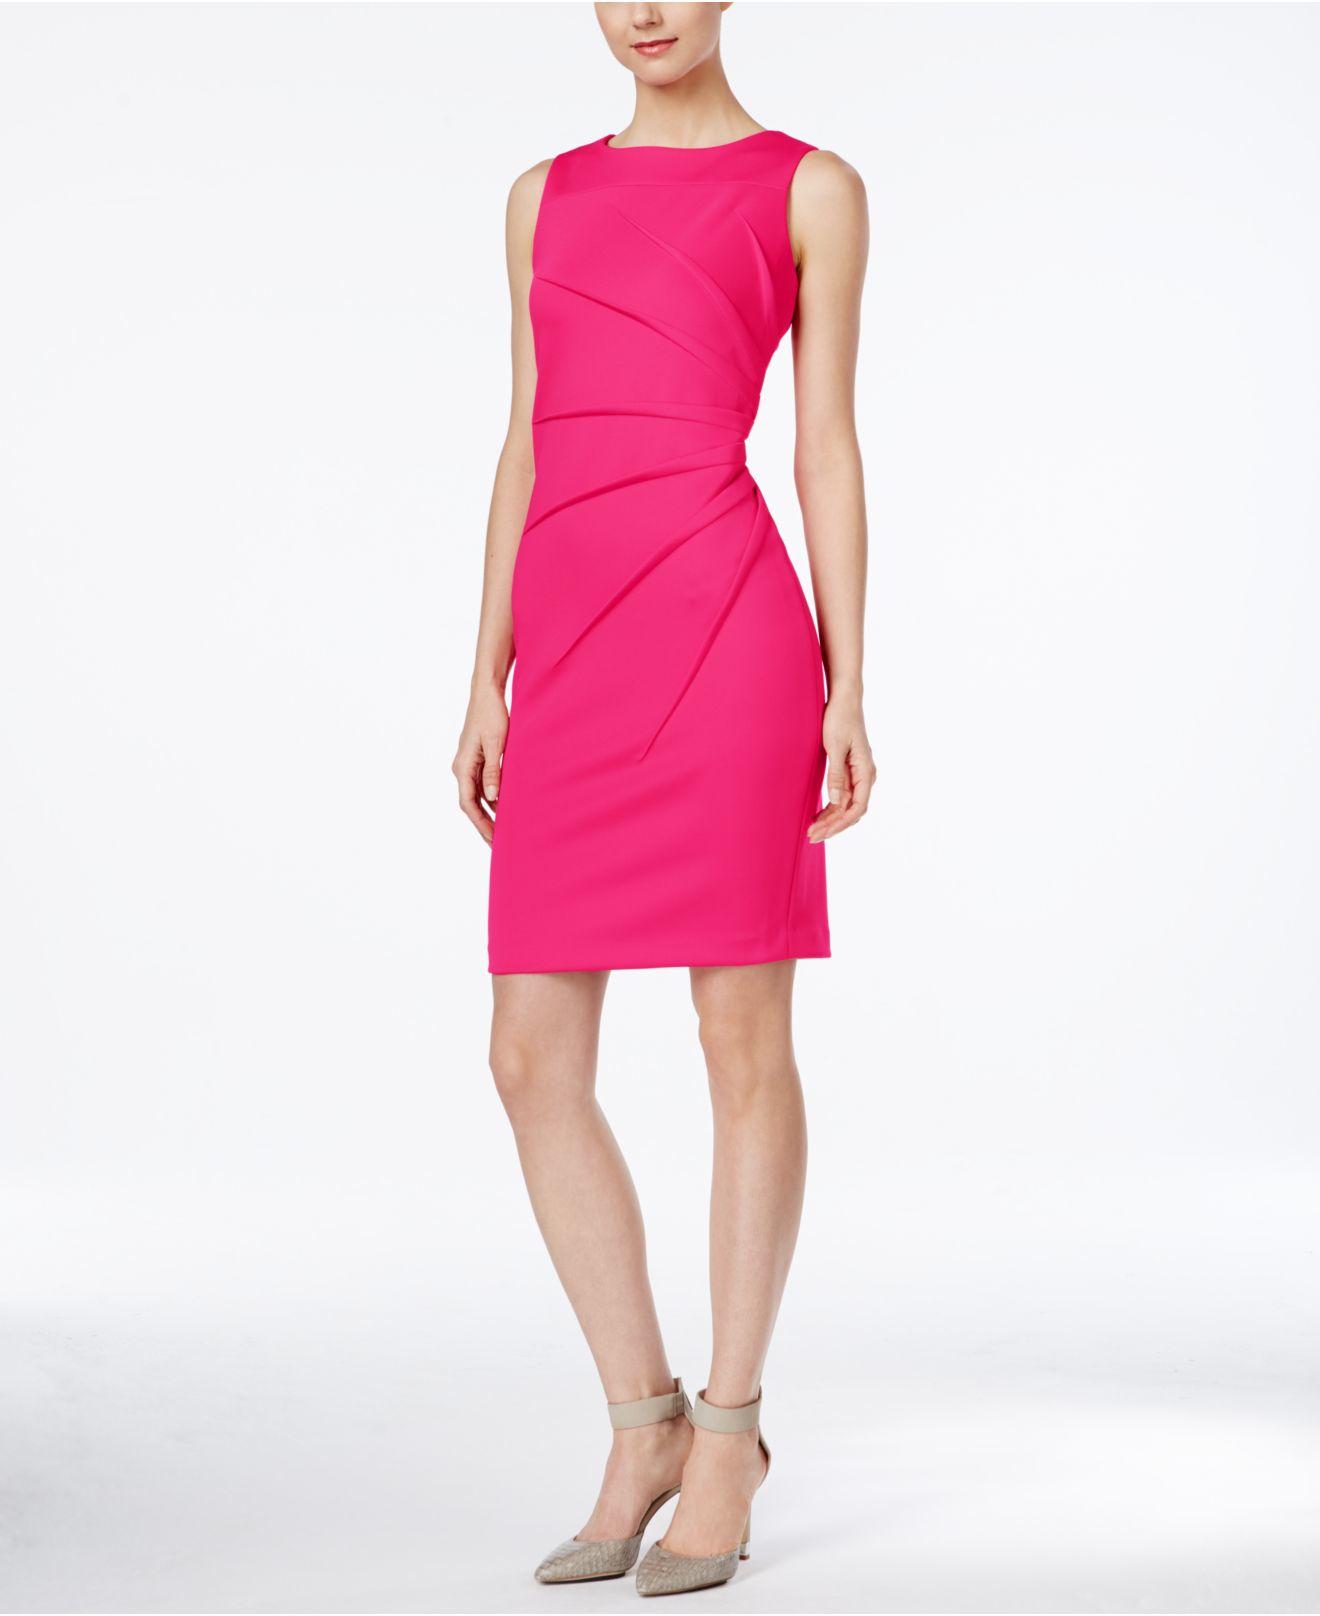 Pink Dress Macys